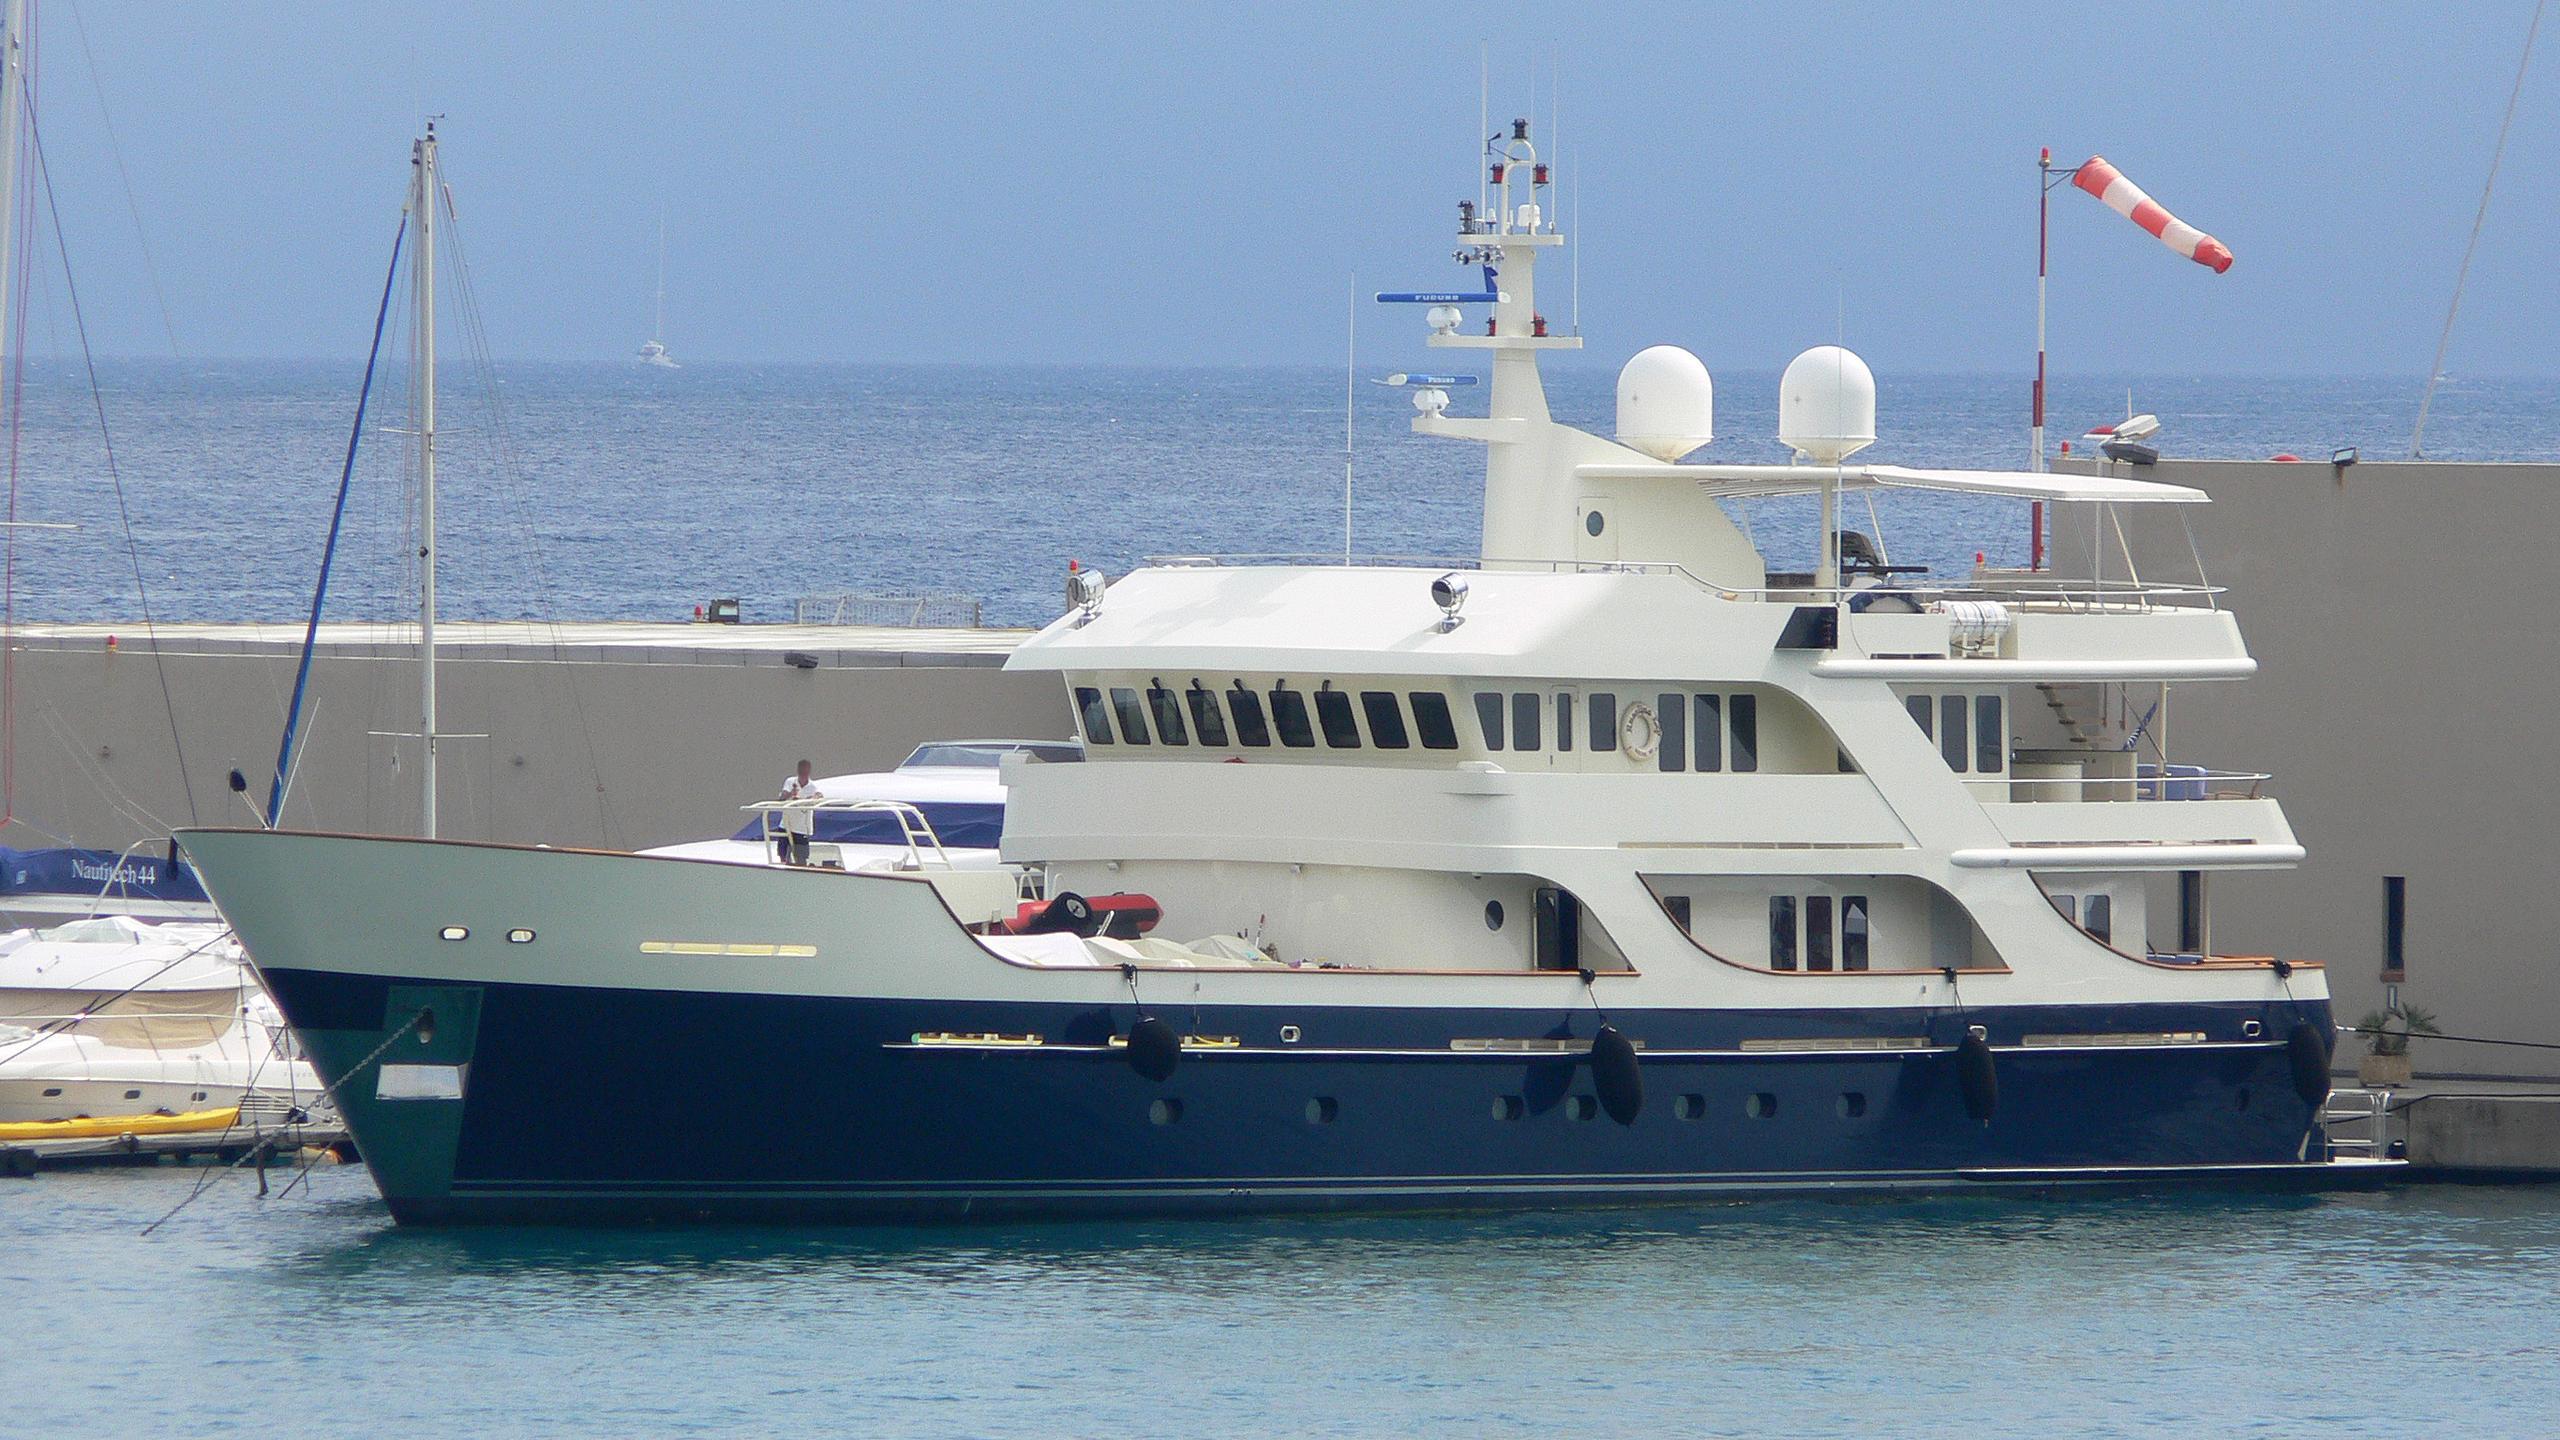 liberta-explorer-yacht-newcastle-marine-2007-42m-half-profile